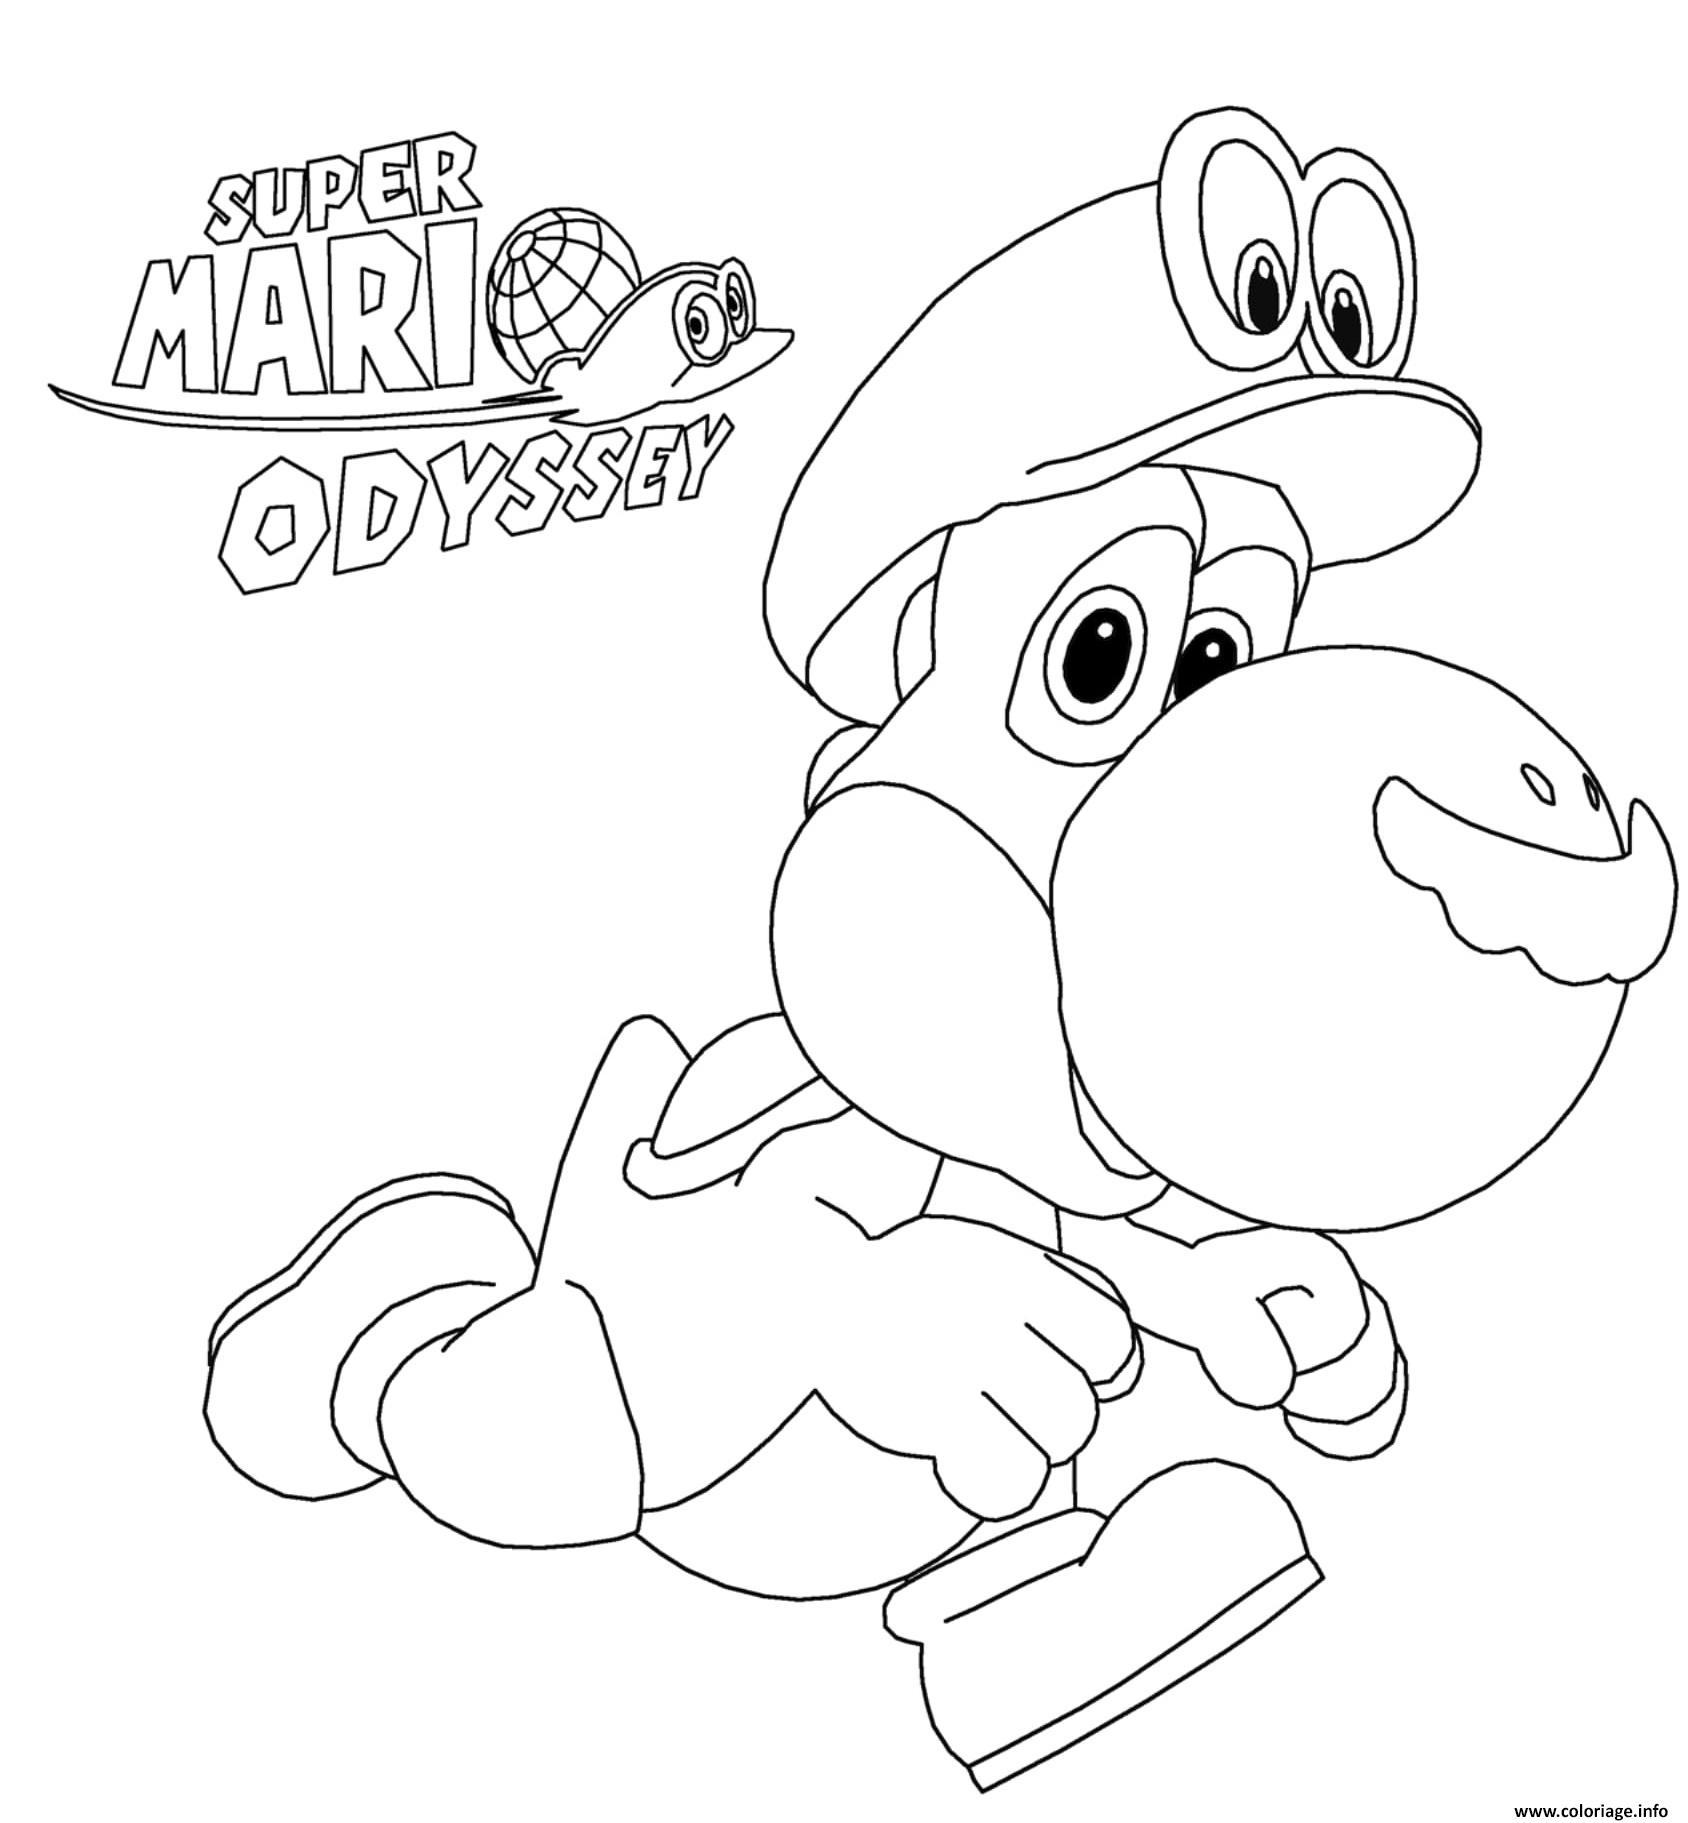 Coloriage Super Mario Odyssey Yoshi Nintendo Jecolorie Com